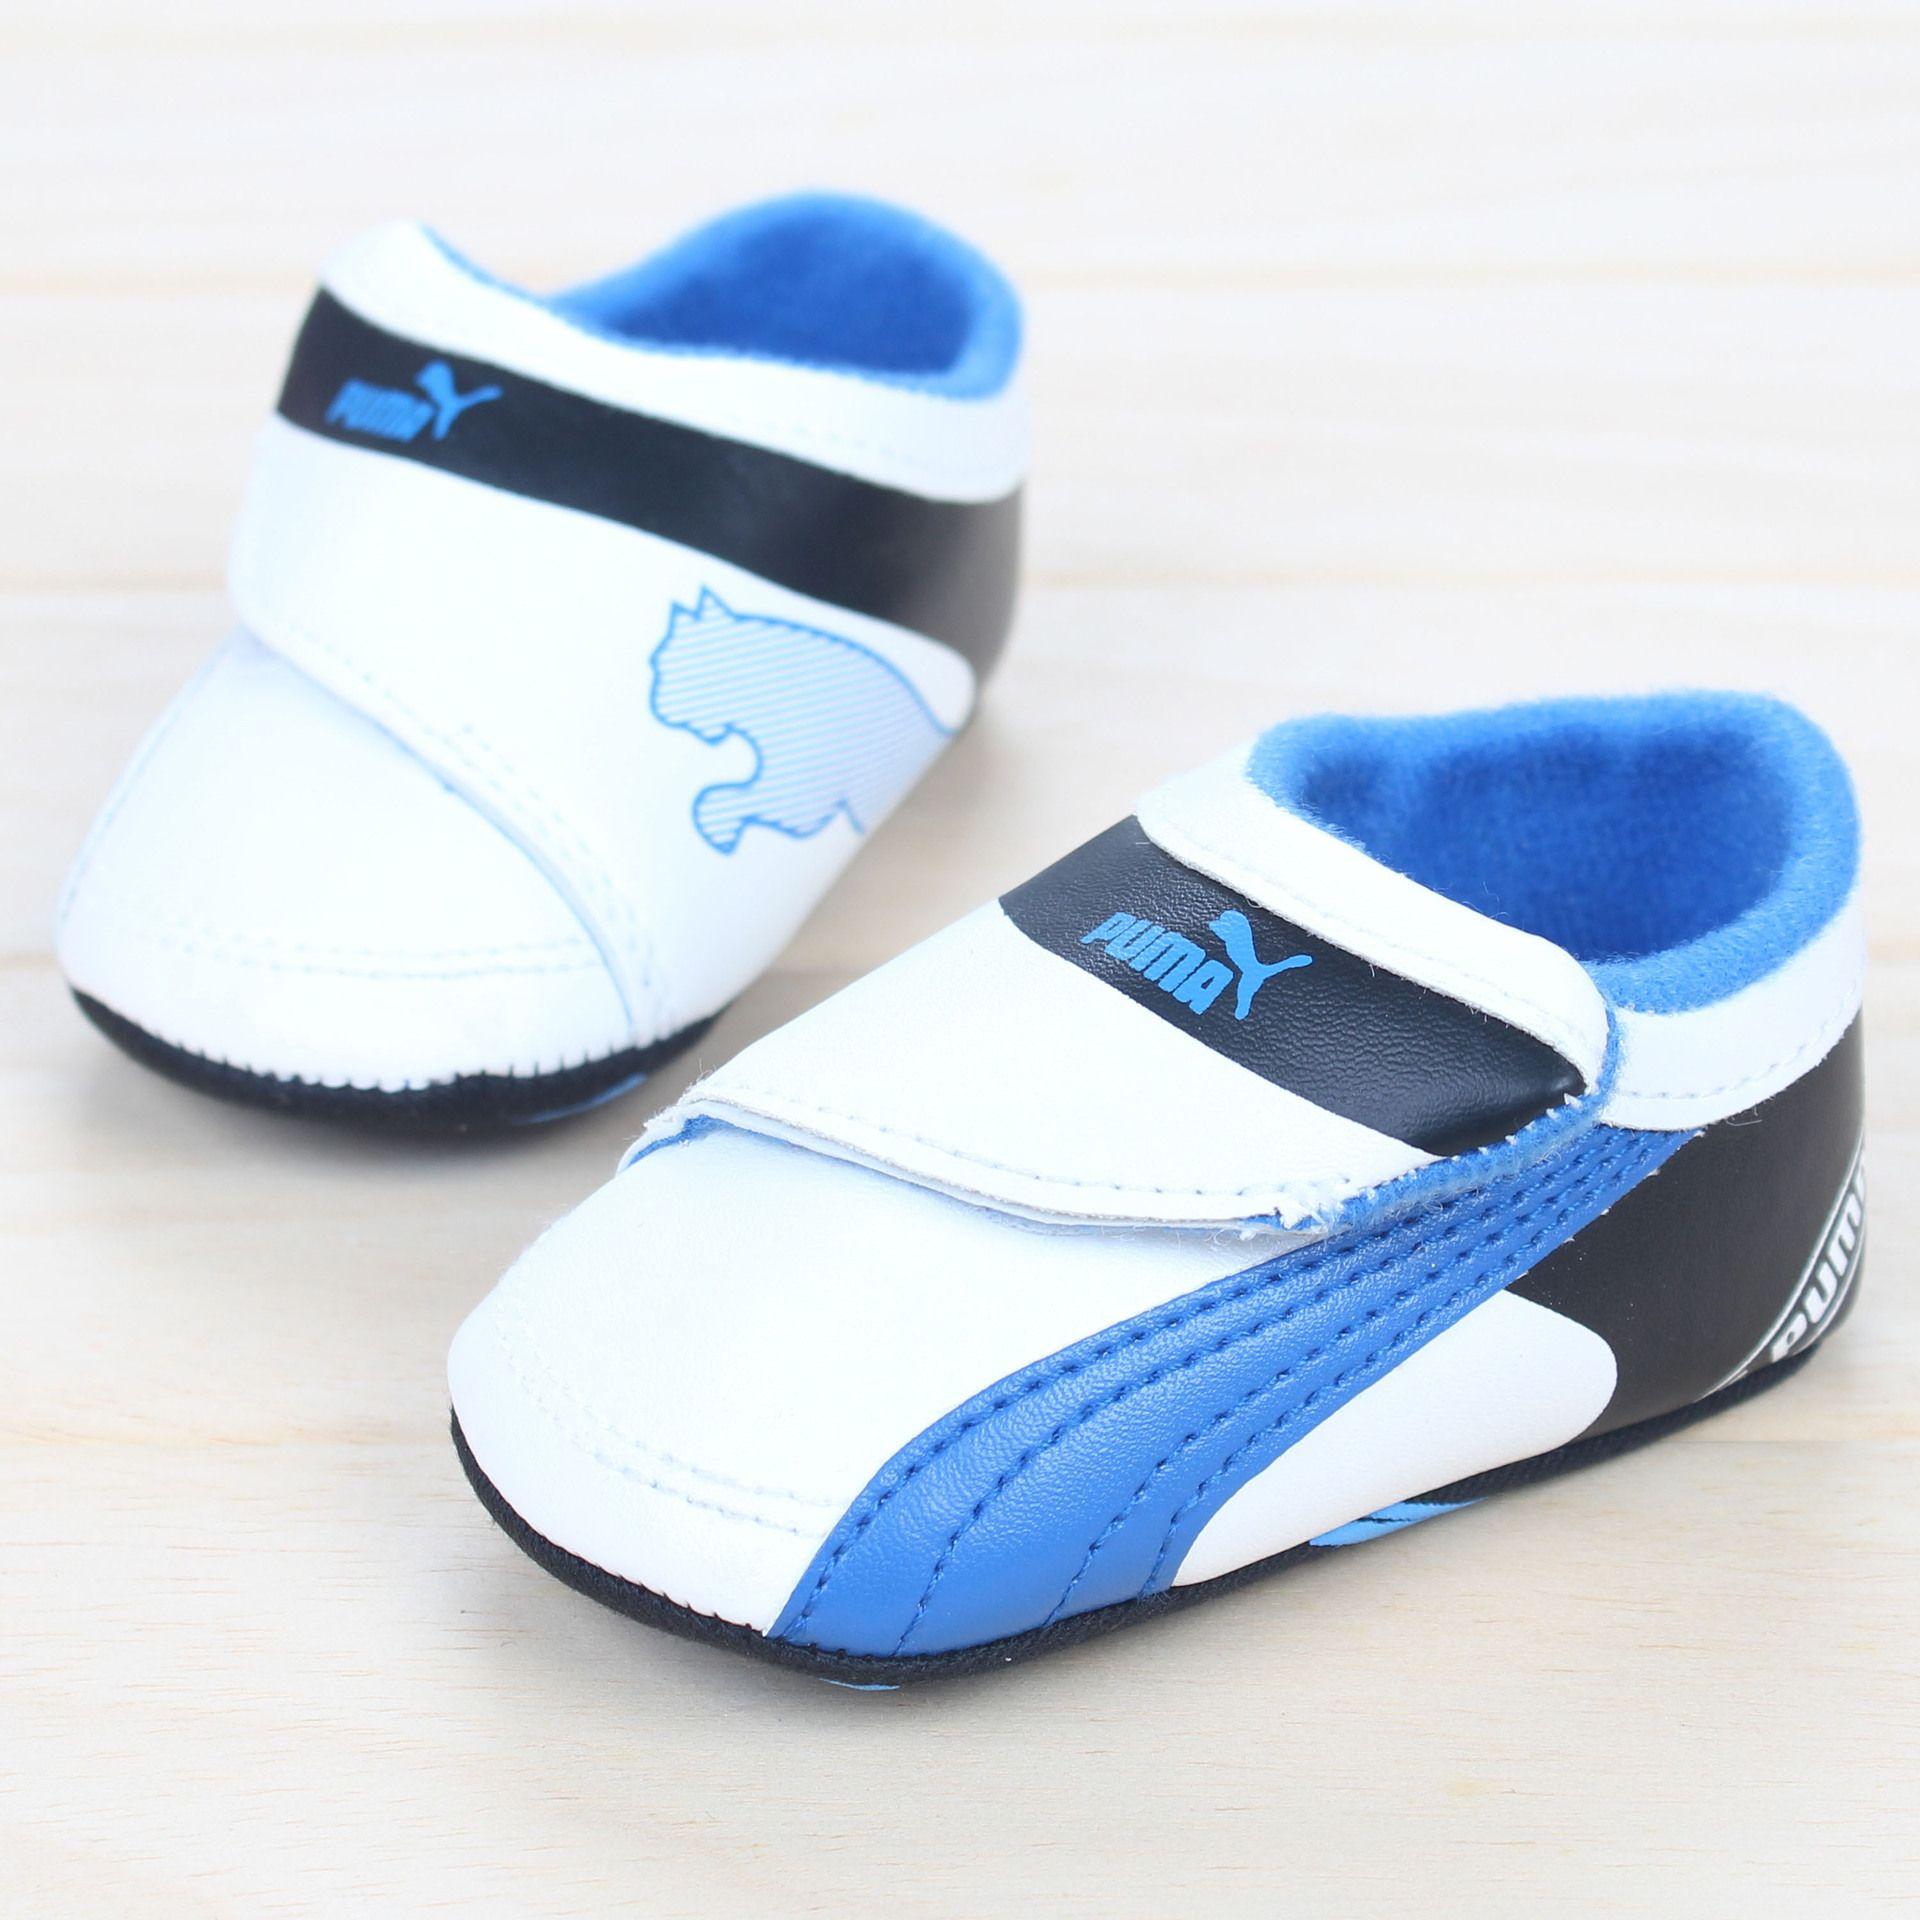 puma Baby Shoes Soft Bottom Boy Prewalker Shoes Pinterest